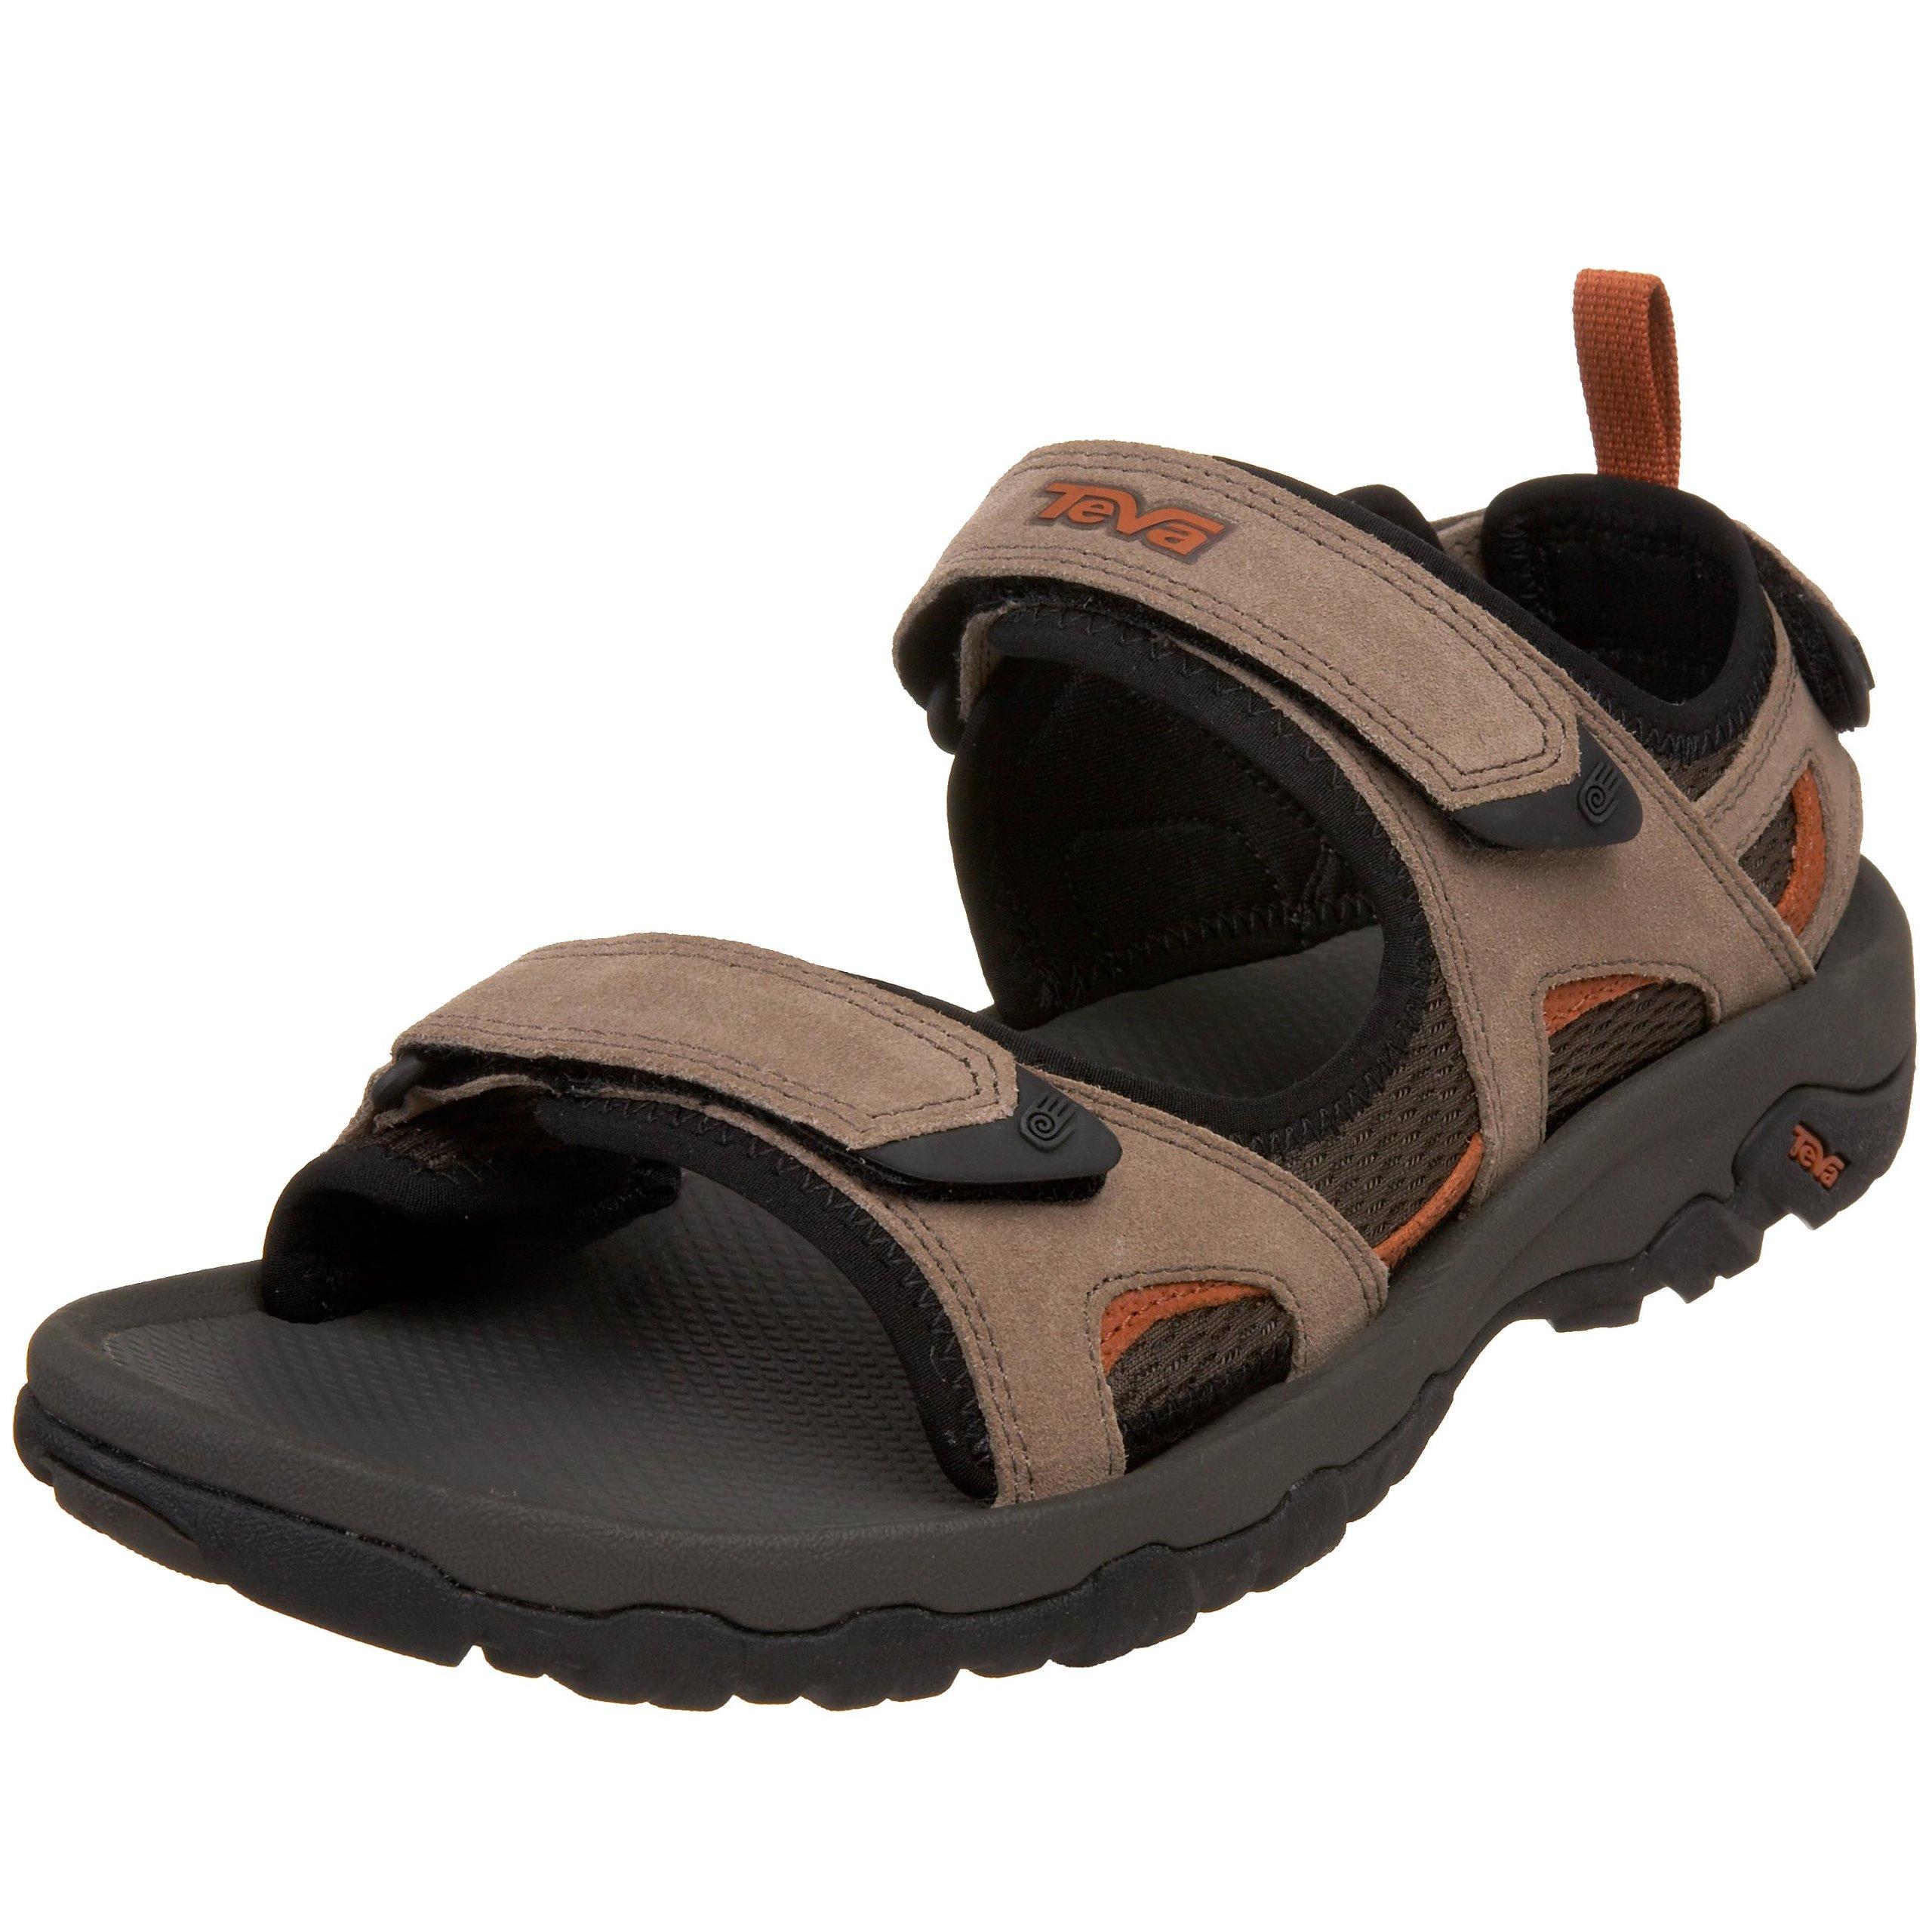 aecabc952f0a Get Quotations · Teva Men s Katavi Outdoor Sandal